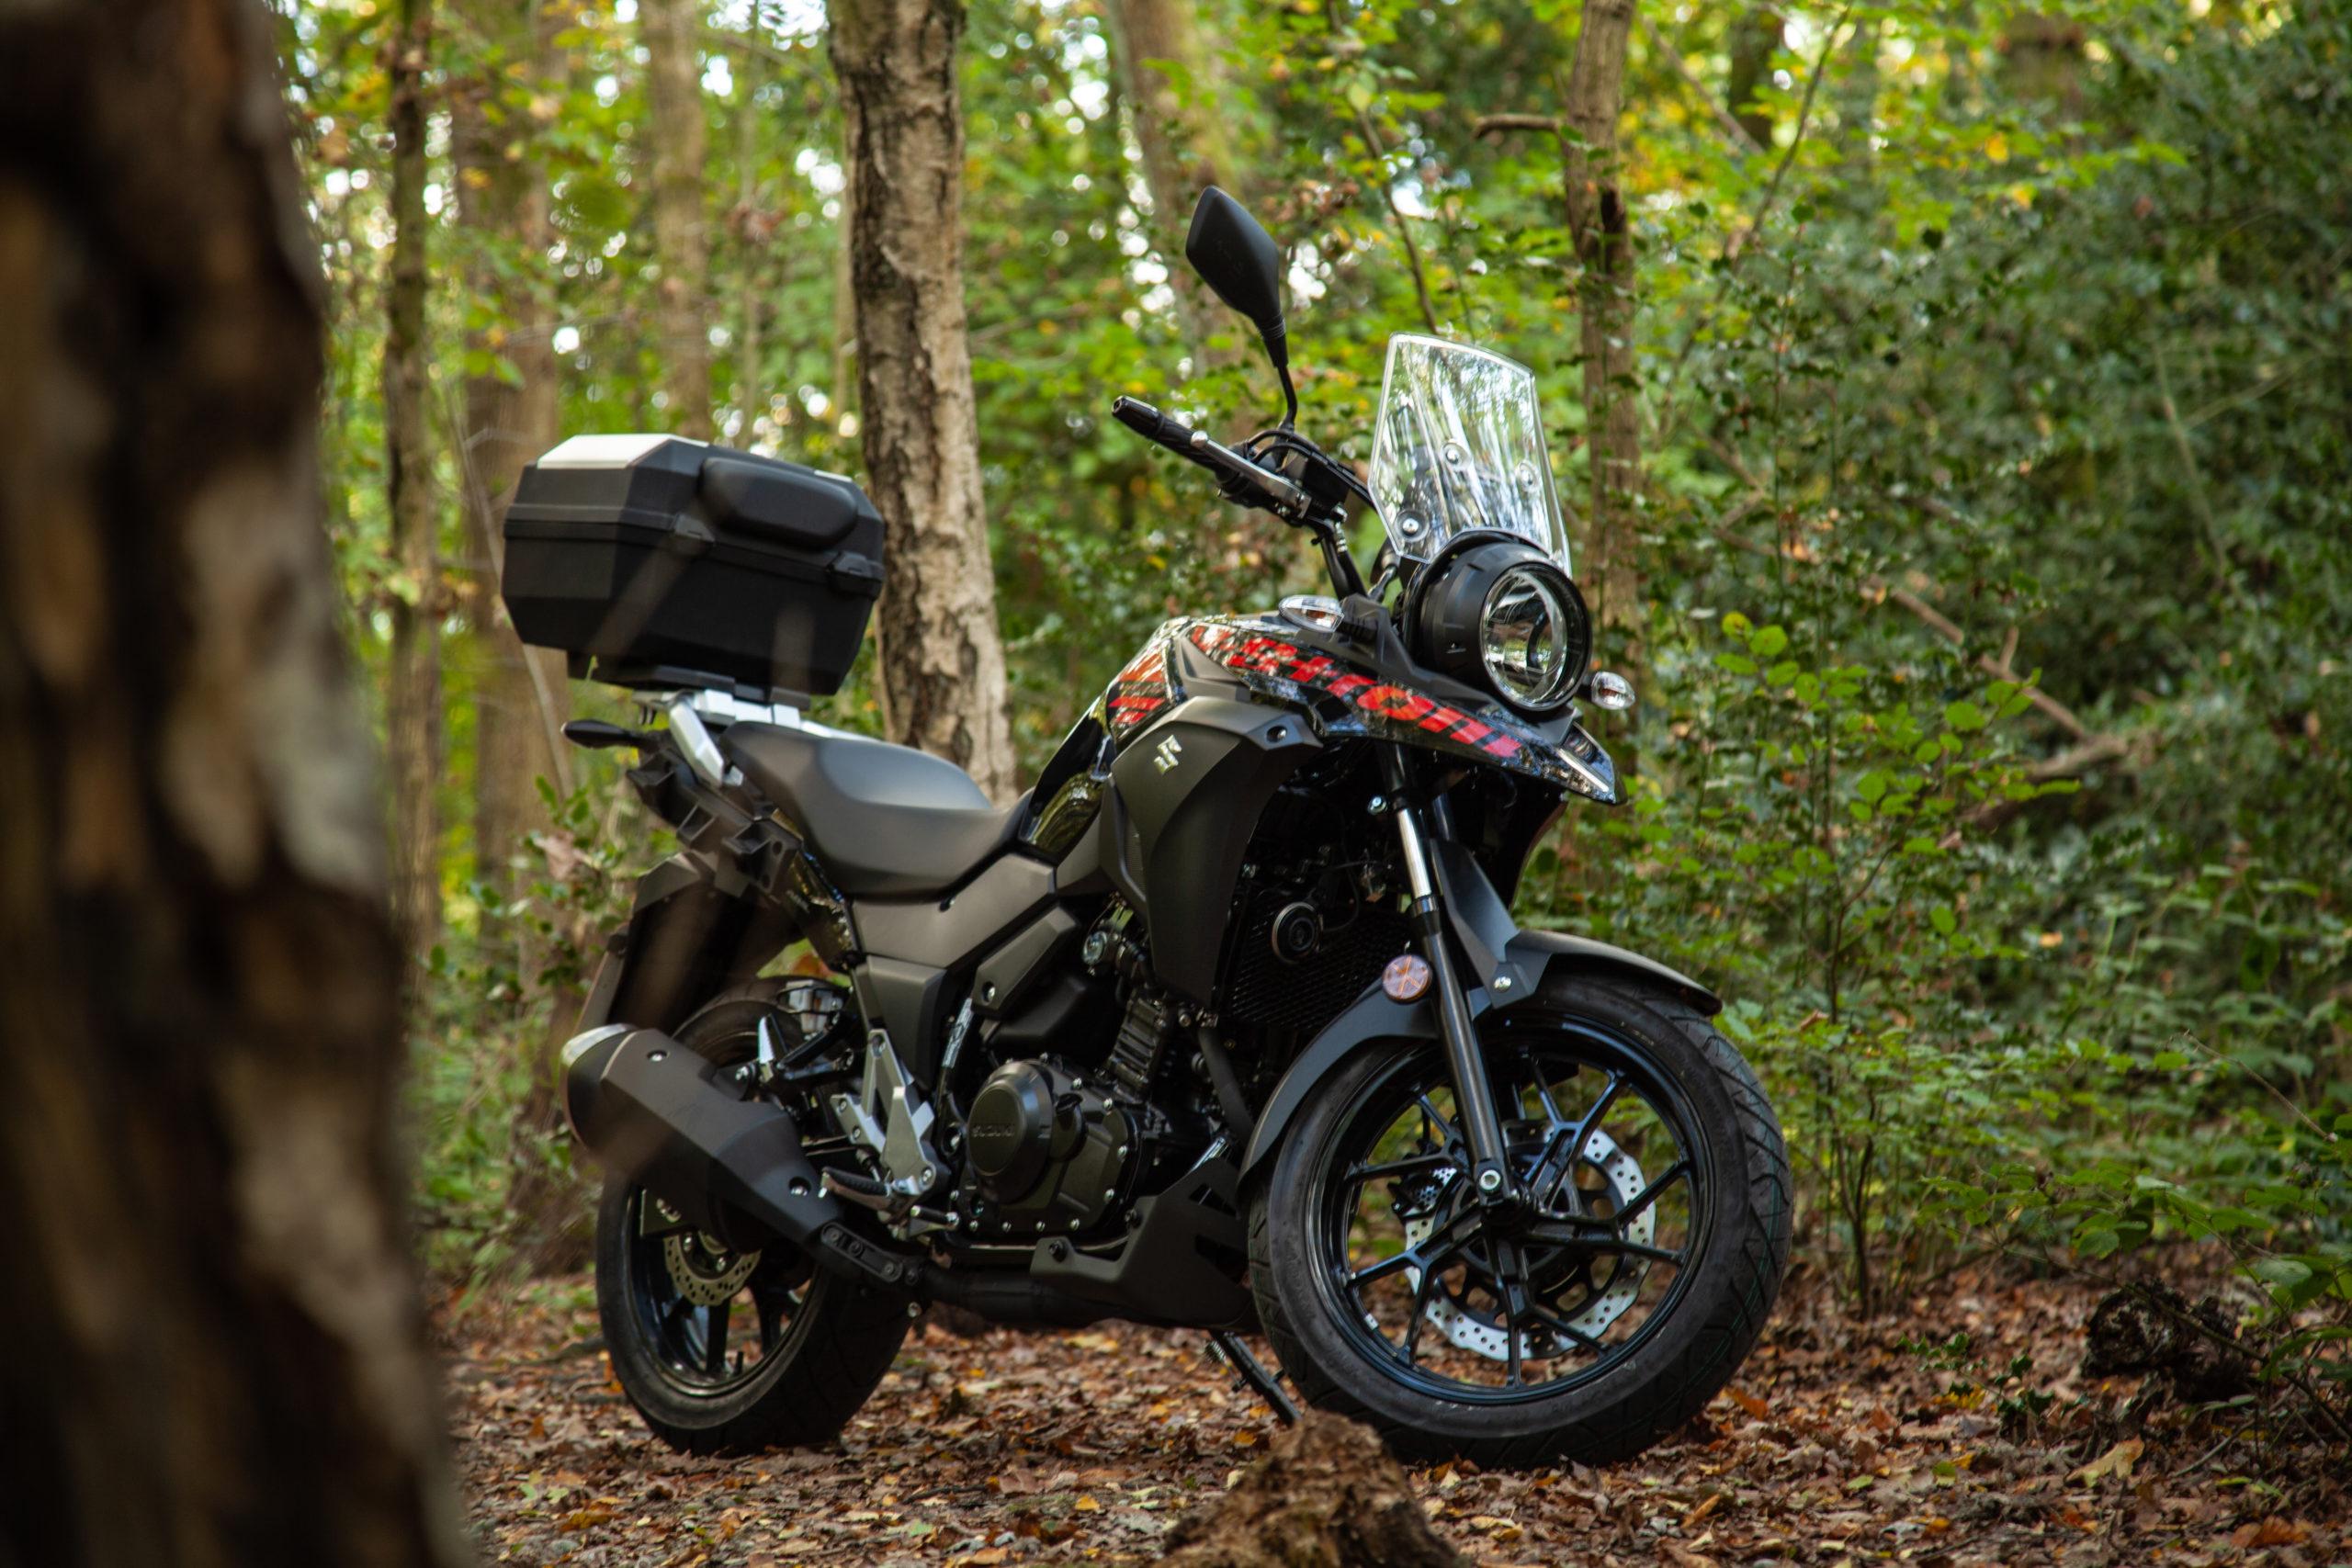 Suzuki dl250 off roading in the woods 2